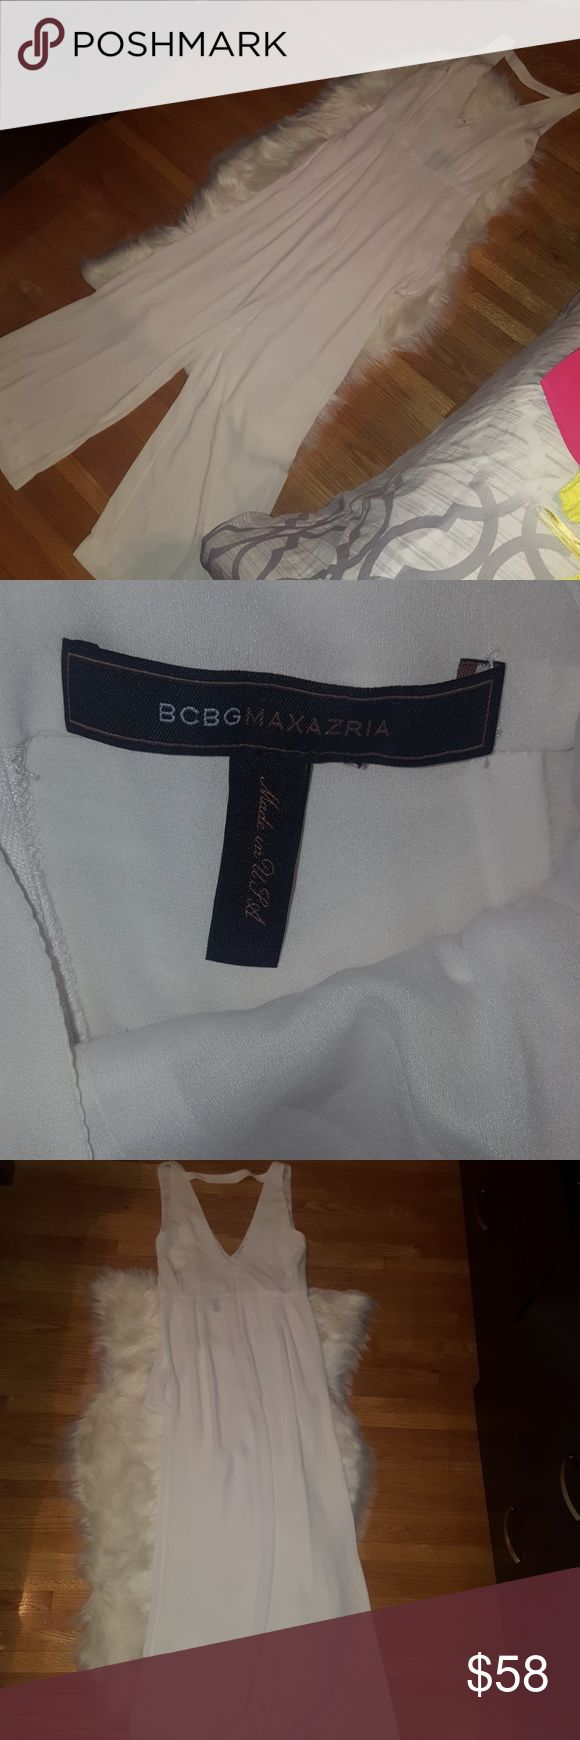 BCBGMAXAZRIA white pants suit jumper onepiece BCBGMAXAZRIA sheer white pantsuit jumper  onepiece  Pet, Pest and Smoke free environment BCBGMaxAzria Pants Jumpsuits & Rompers